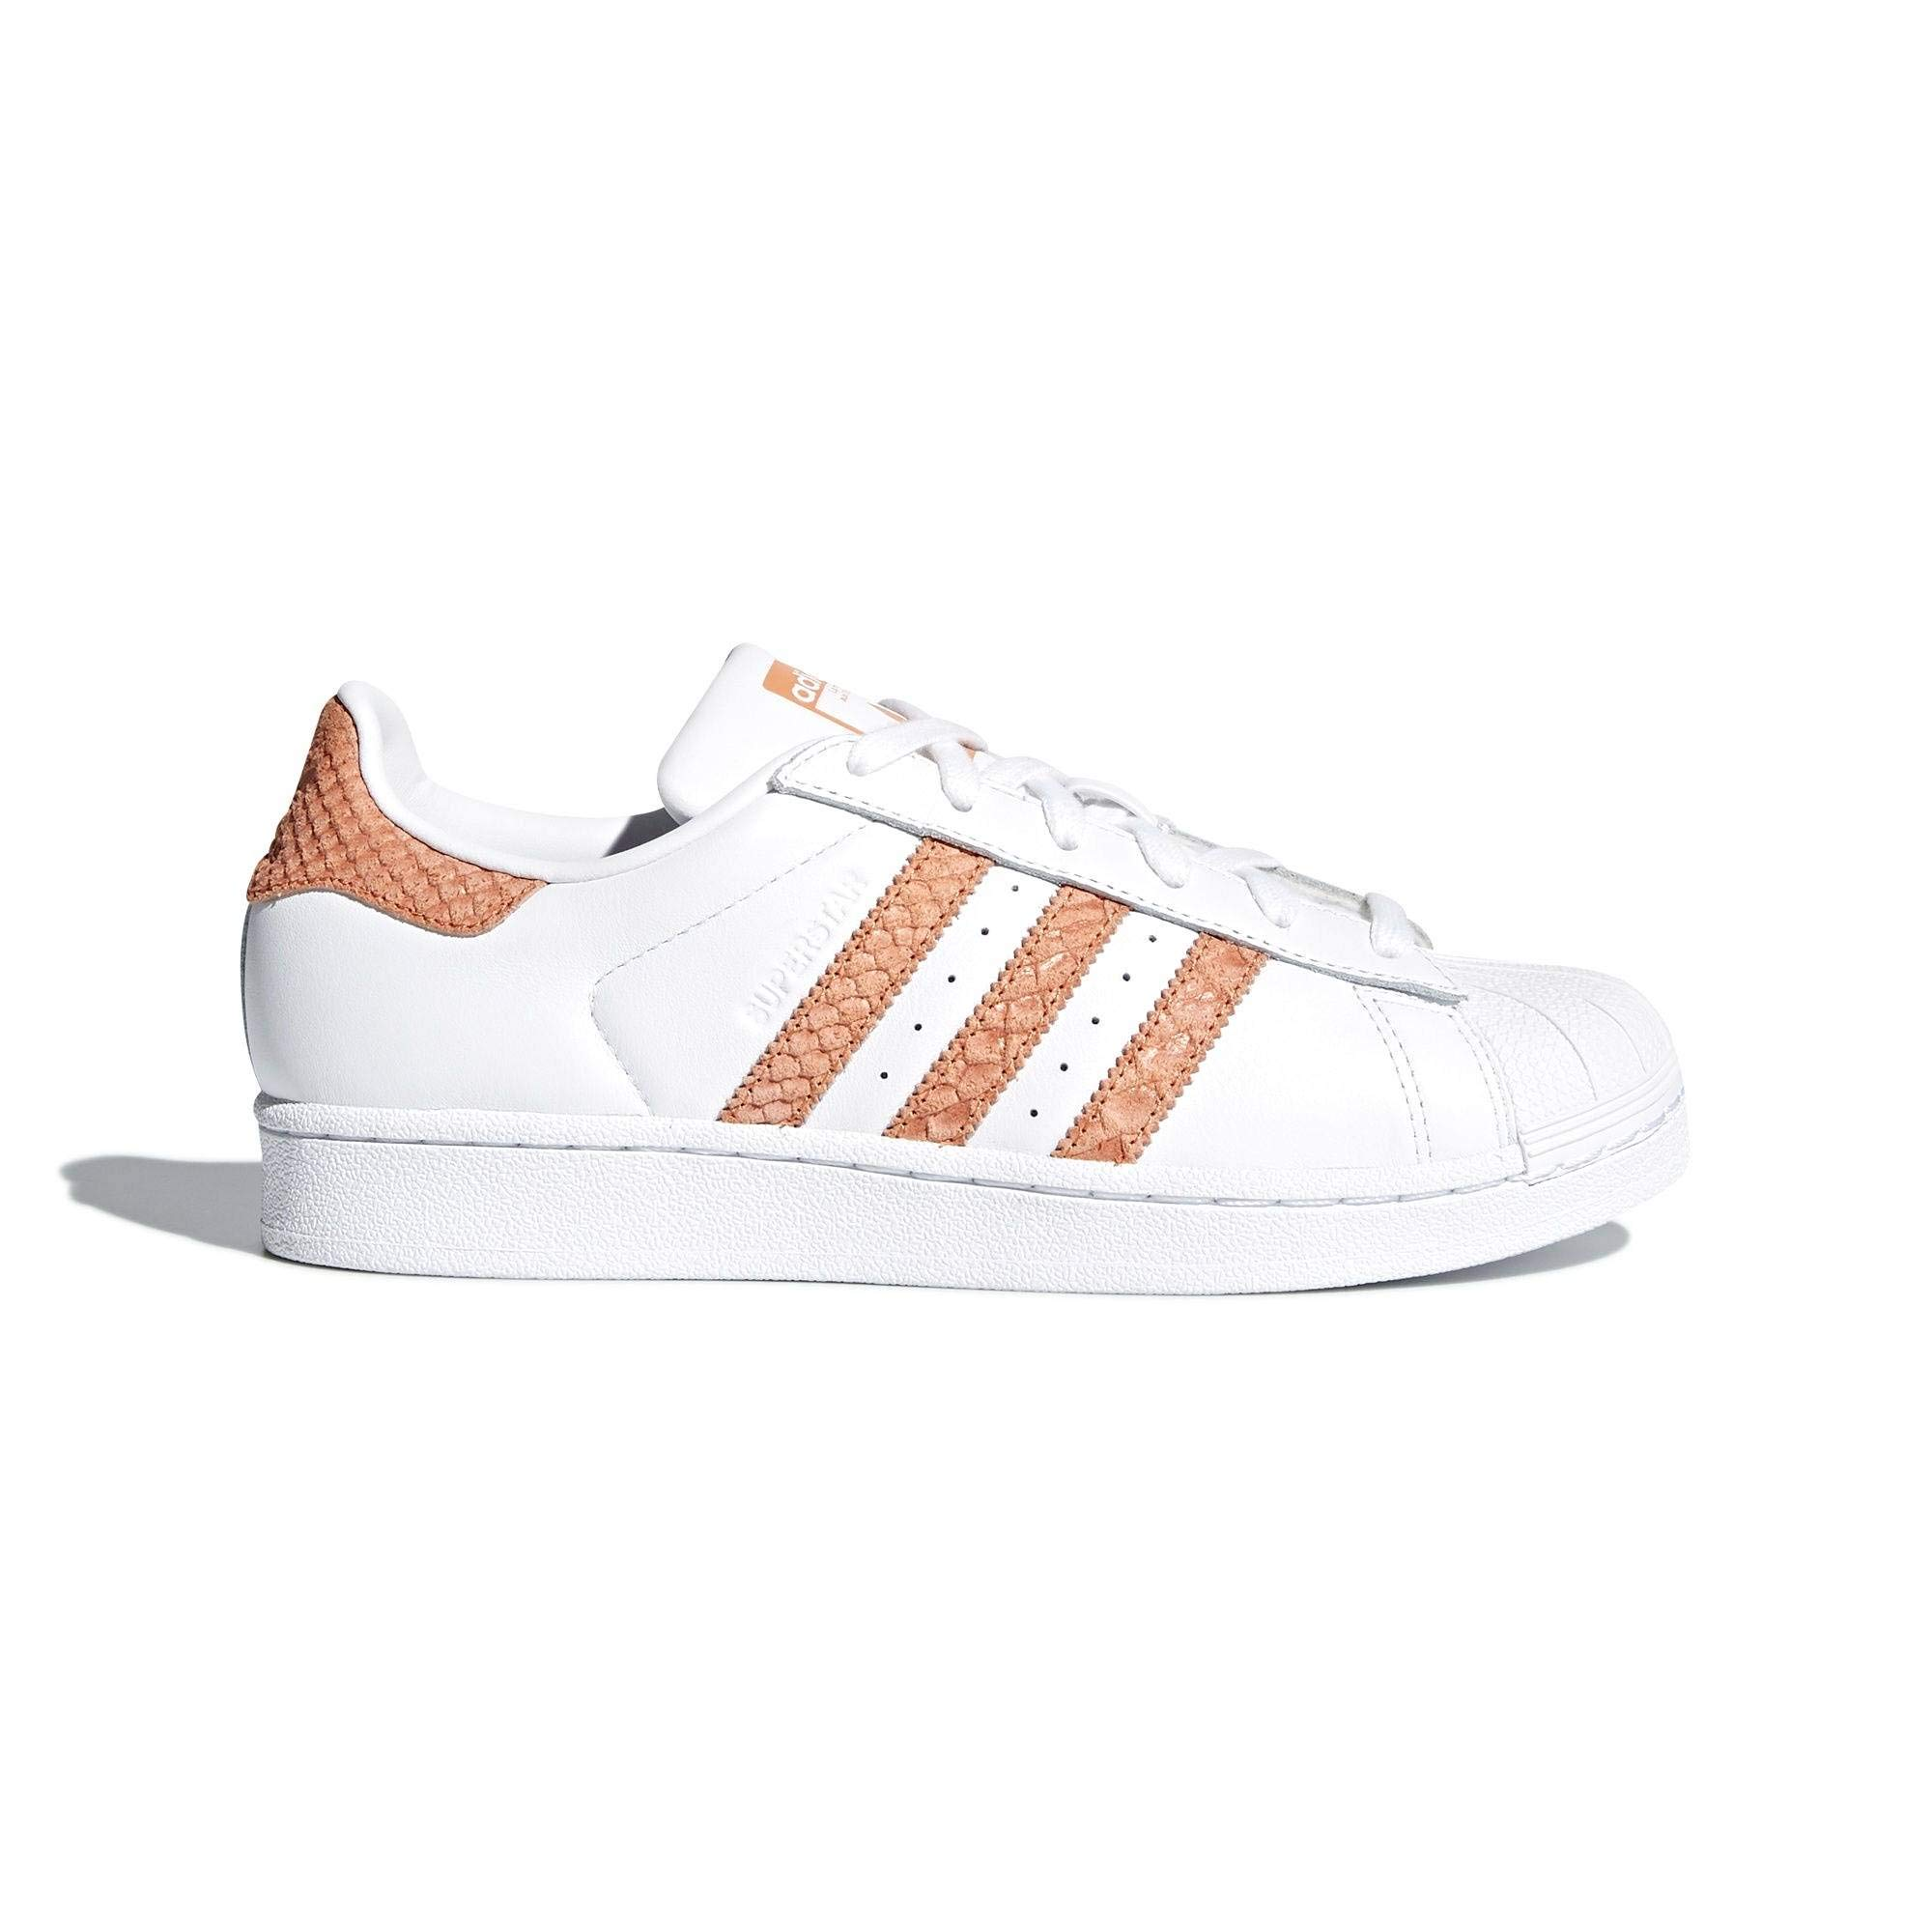 sports shoes 9a4c1 a4b08 adidas Superstar, Scarpe da Fitness Donna – Spesavip